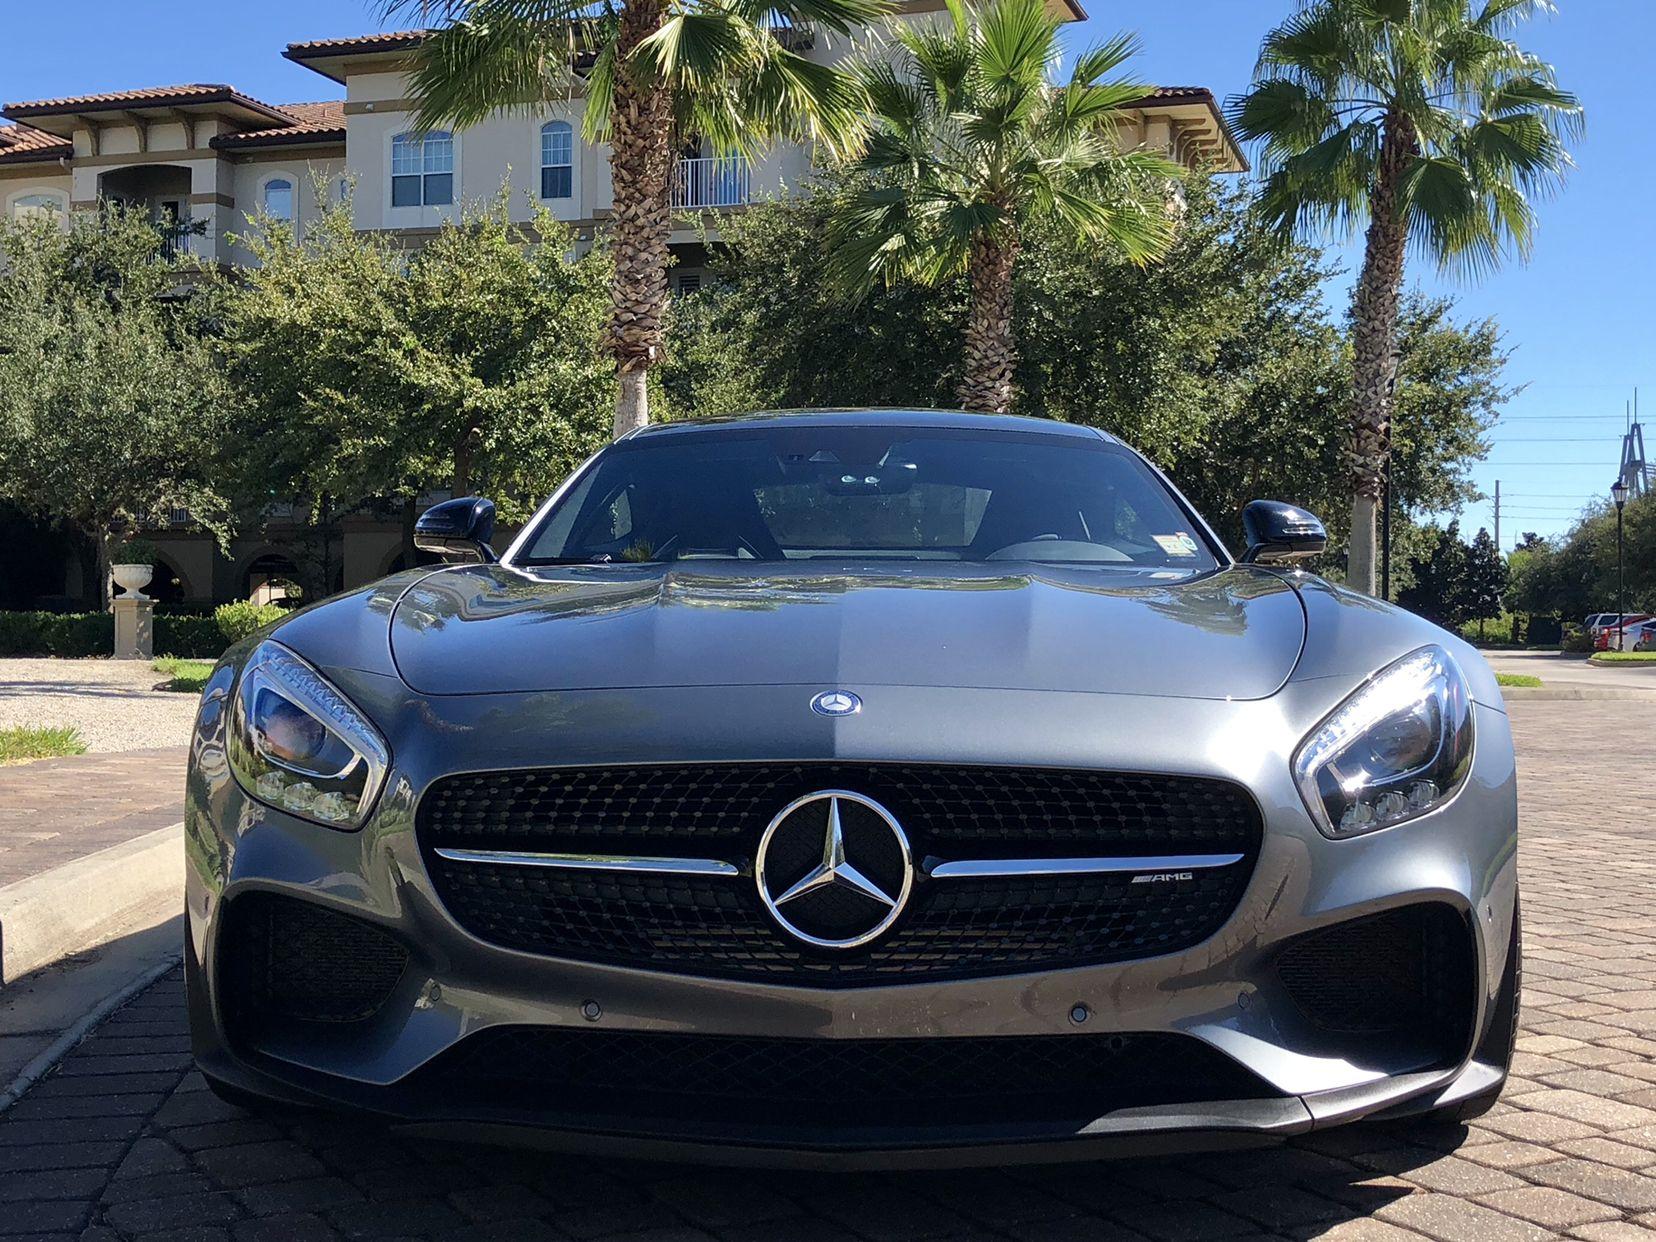 Rare High Performance 500 Plus Horsepower Mercedesbenz Gts Amg